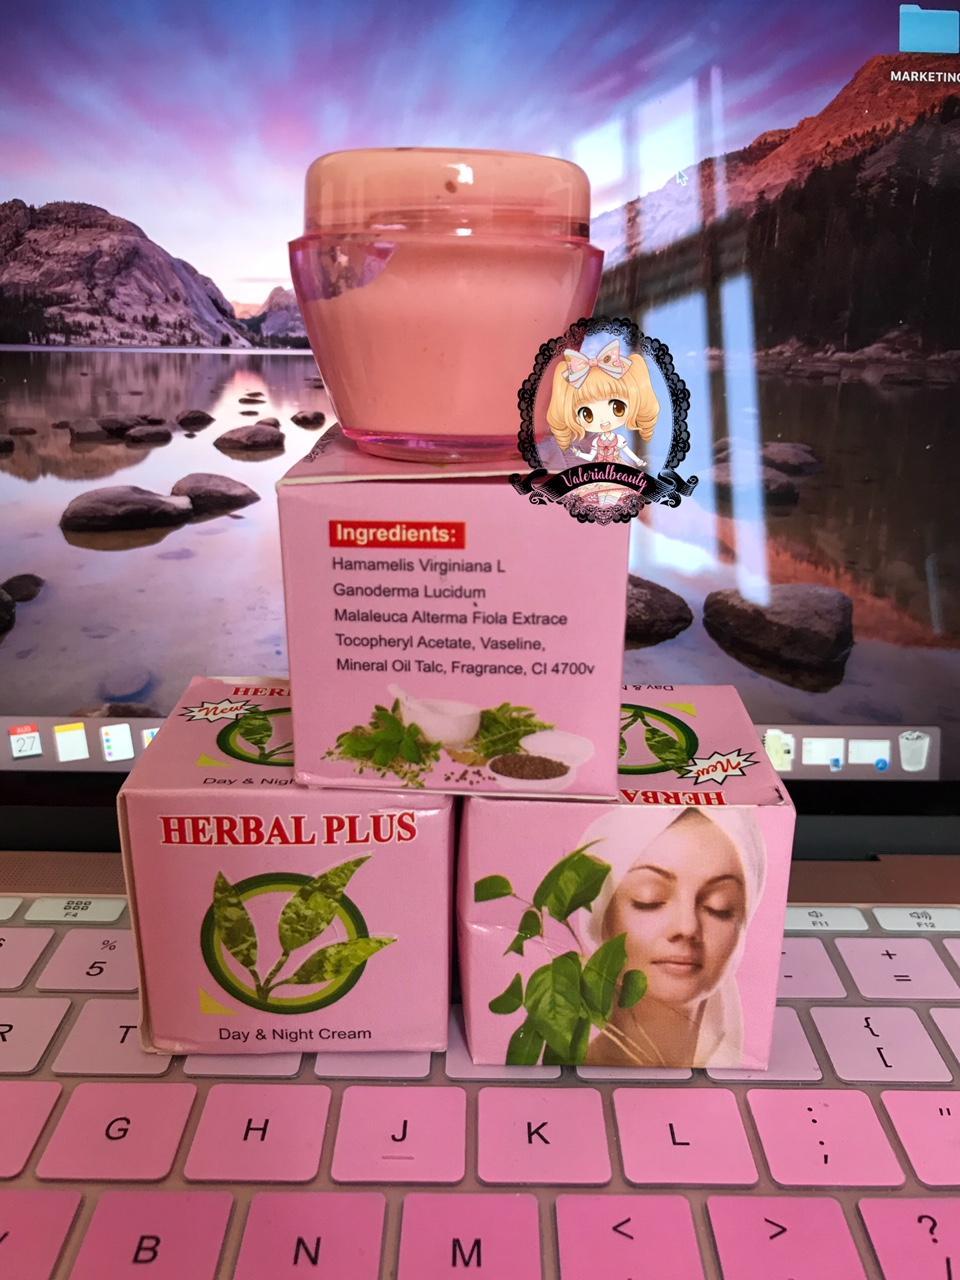 Buy Sell Cheapest Night Cream Original Best Quality Product Deals Dermo Care Whitening Ertos Malam Menghilangkan Flek Hitam Dan Mengecilkan Pori Wajah Dll Herbal Plus Day